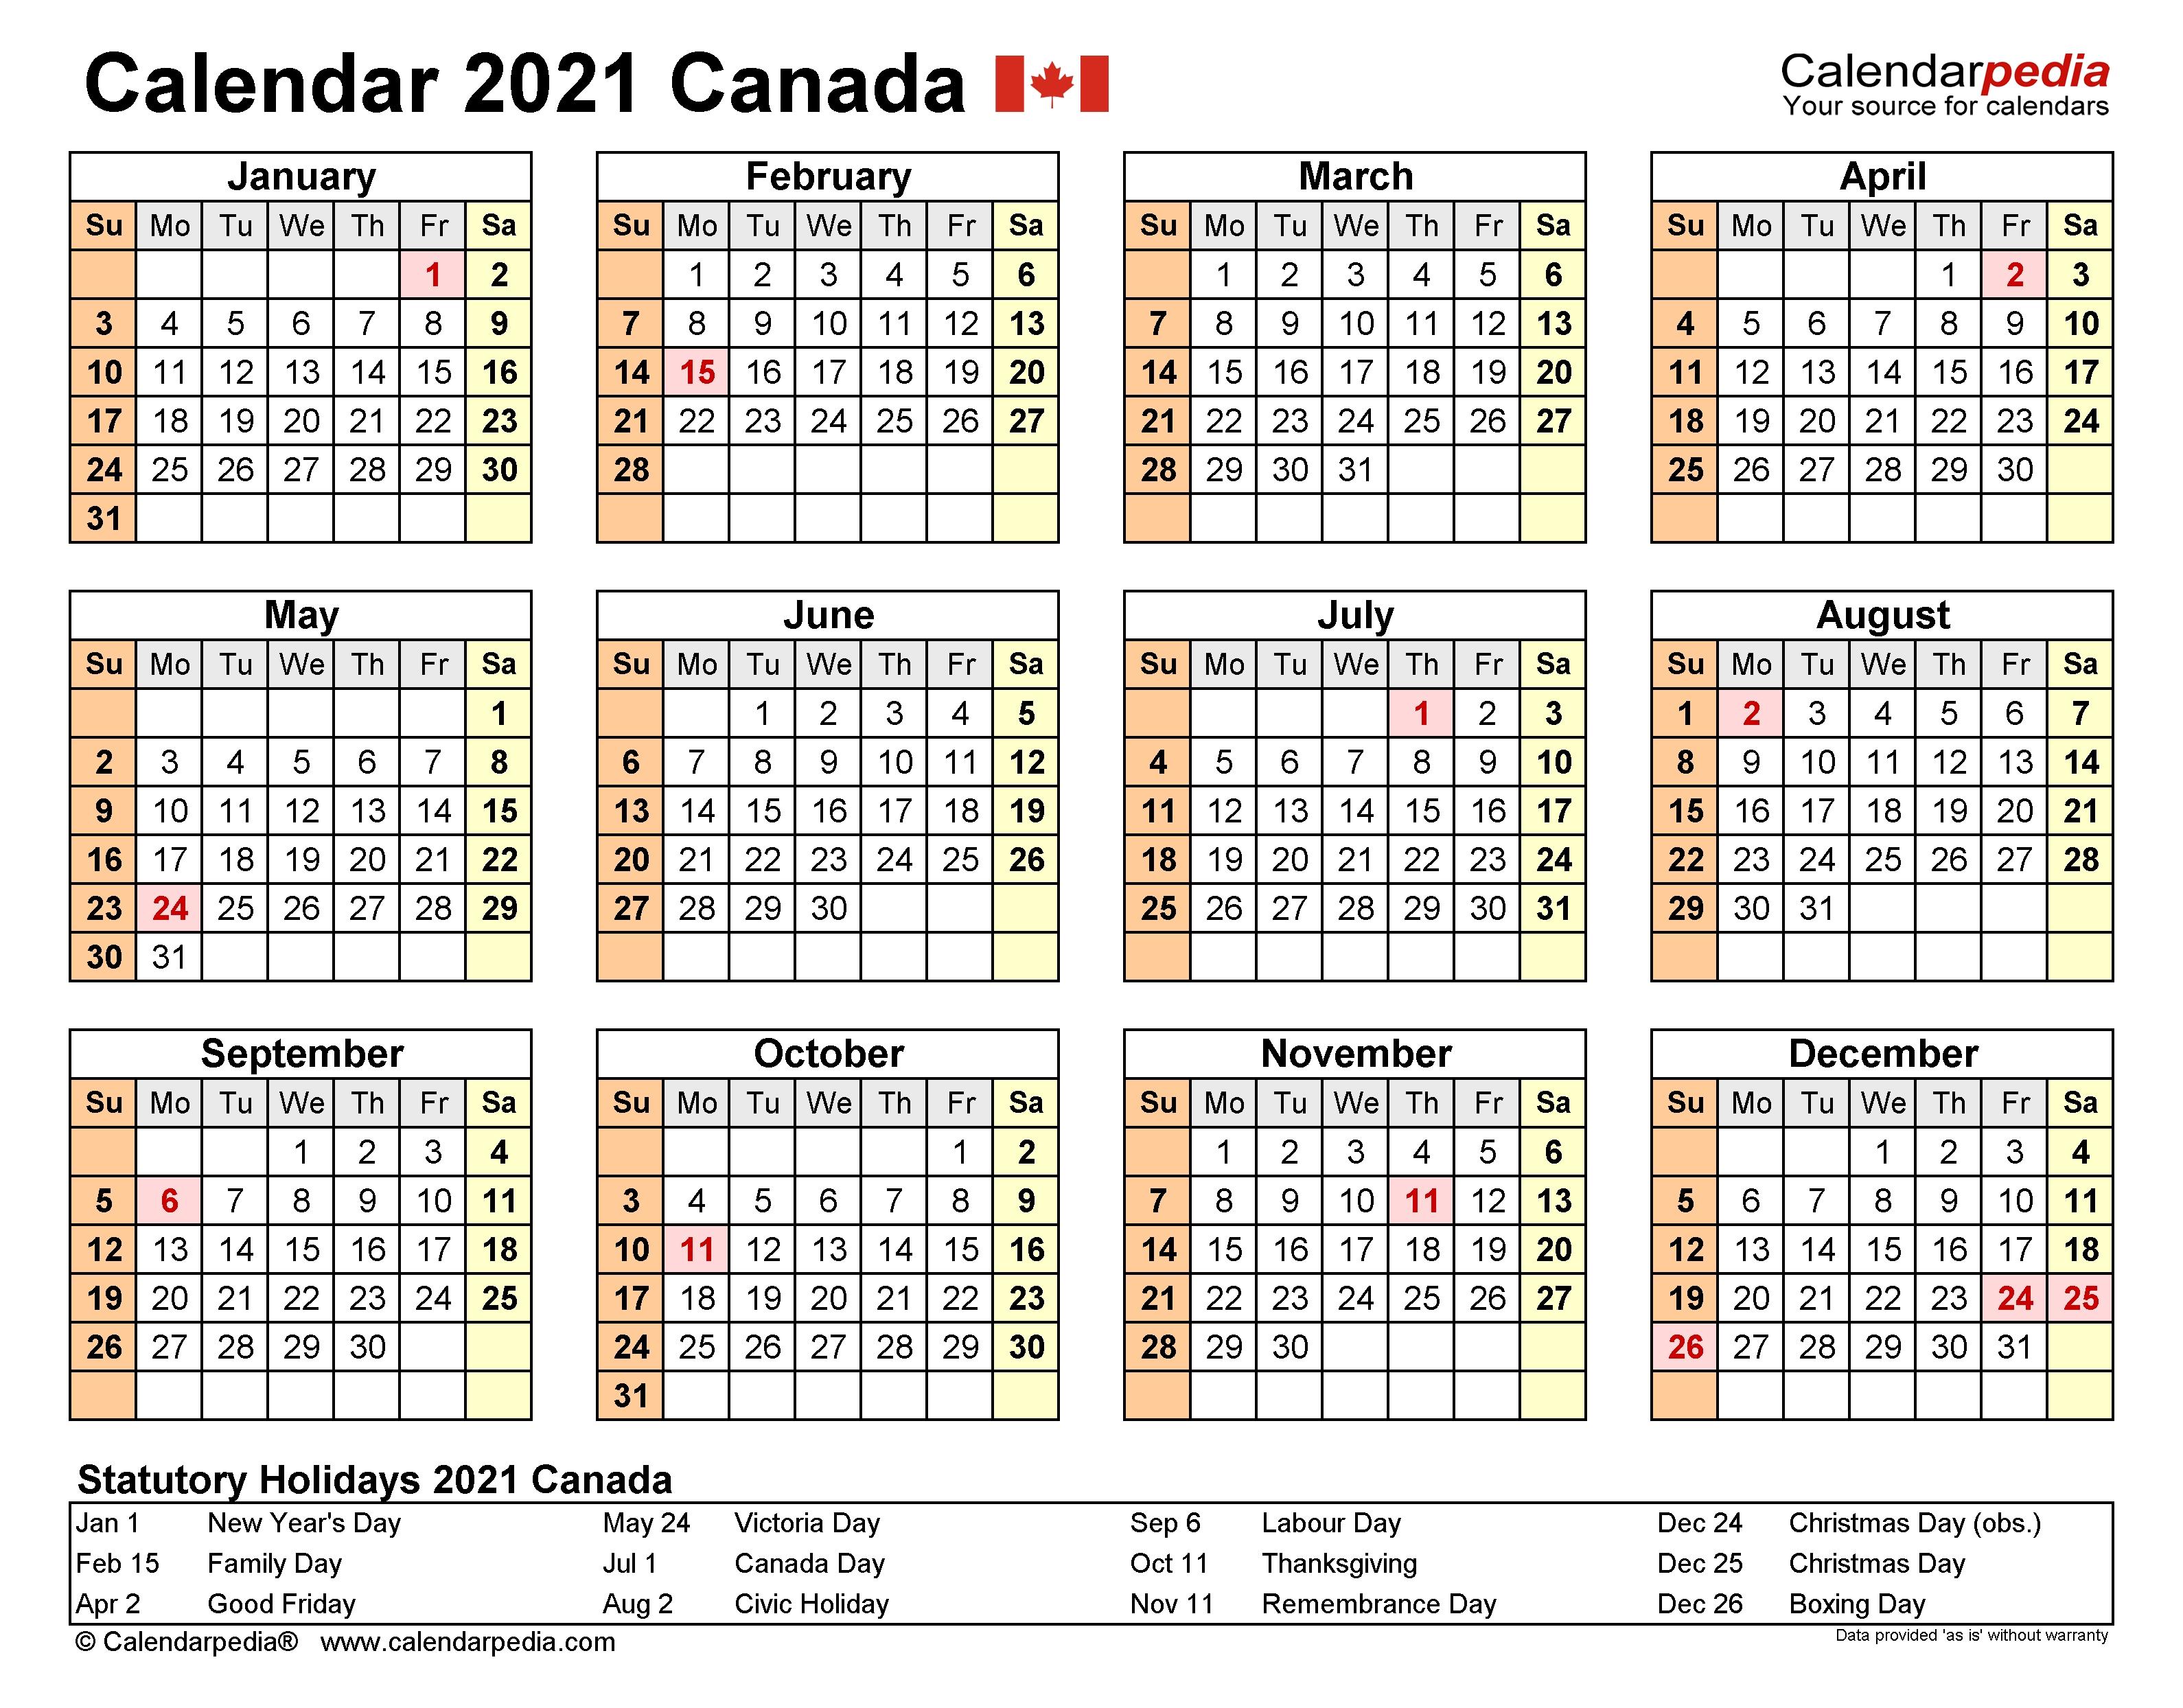 Canada Calendar 2021 - Free Printable Excel Templates  Financial Year 2021